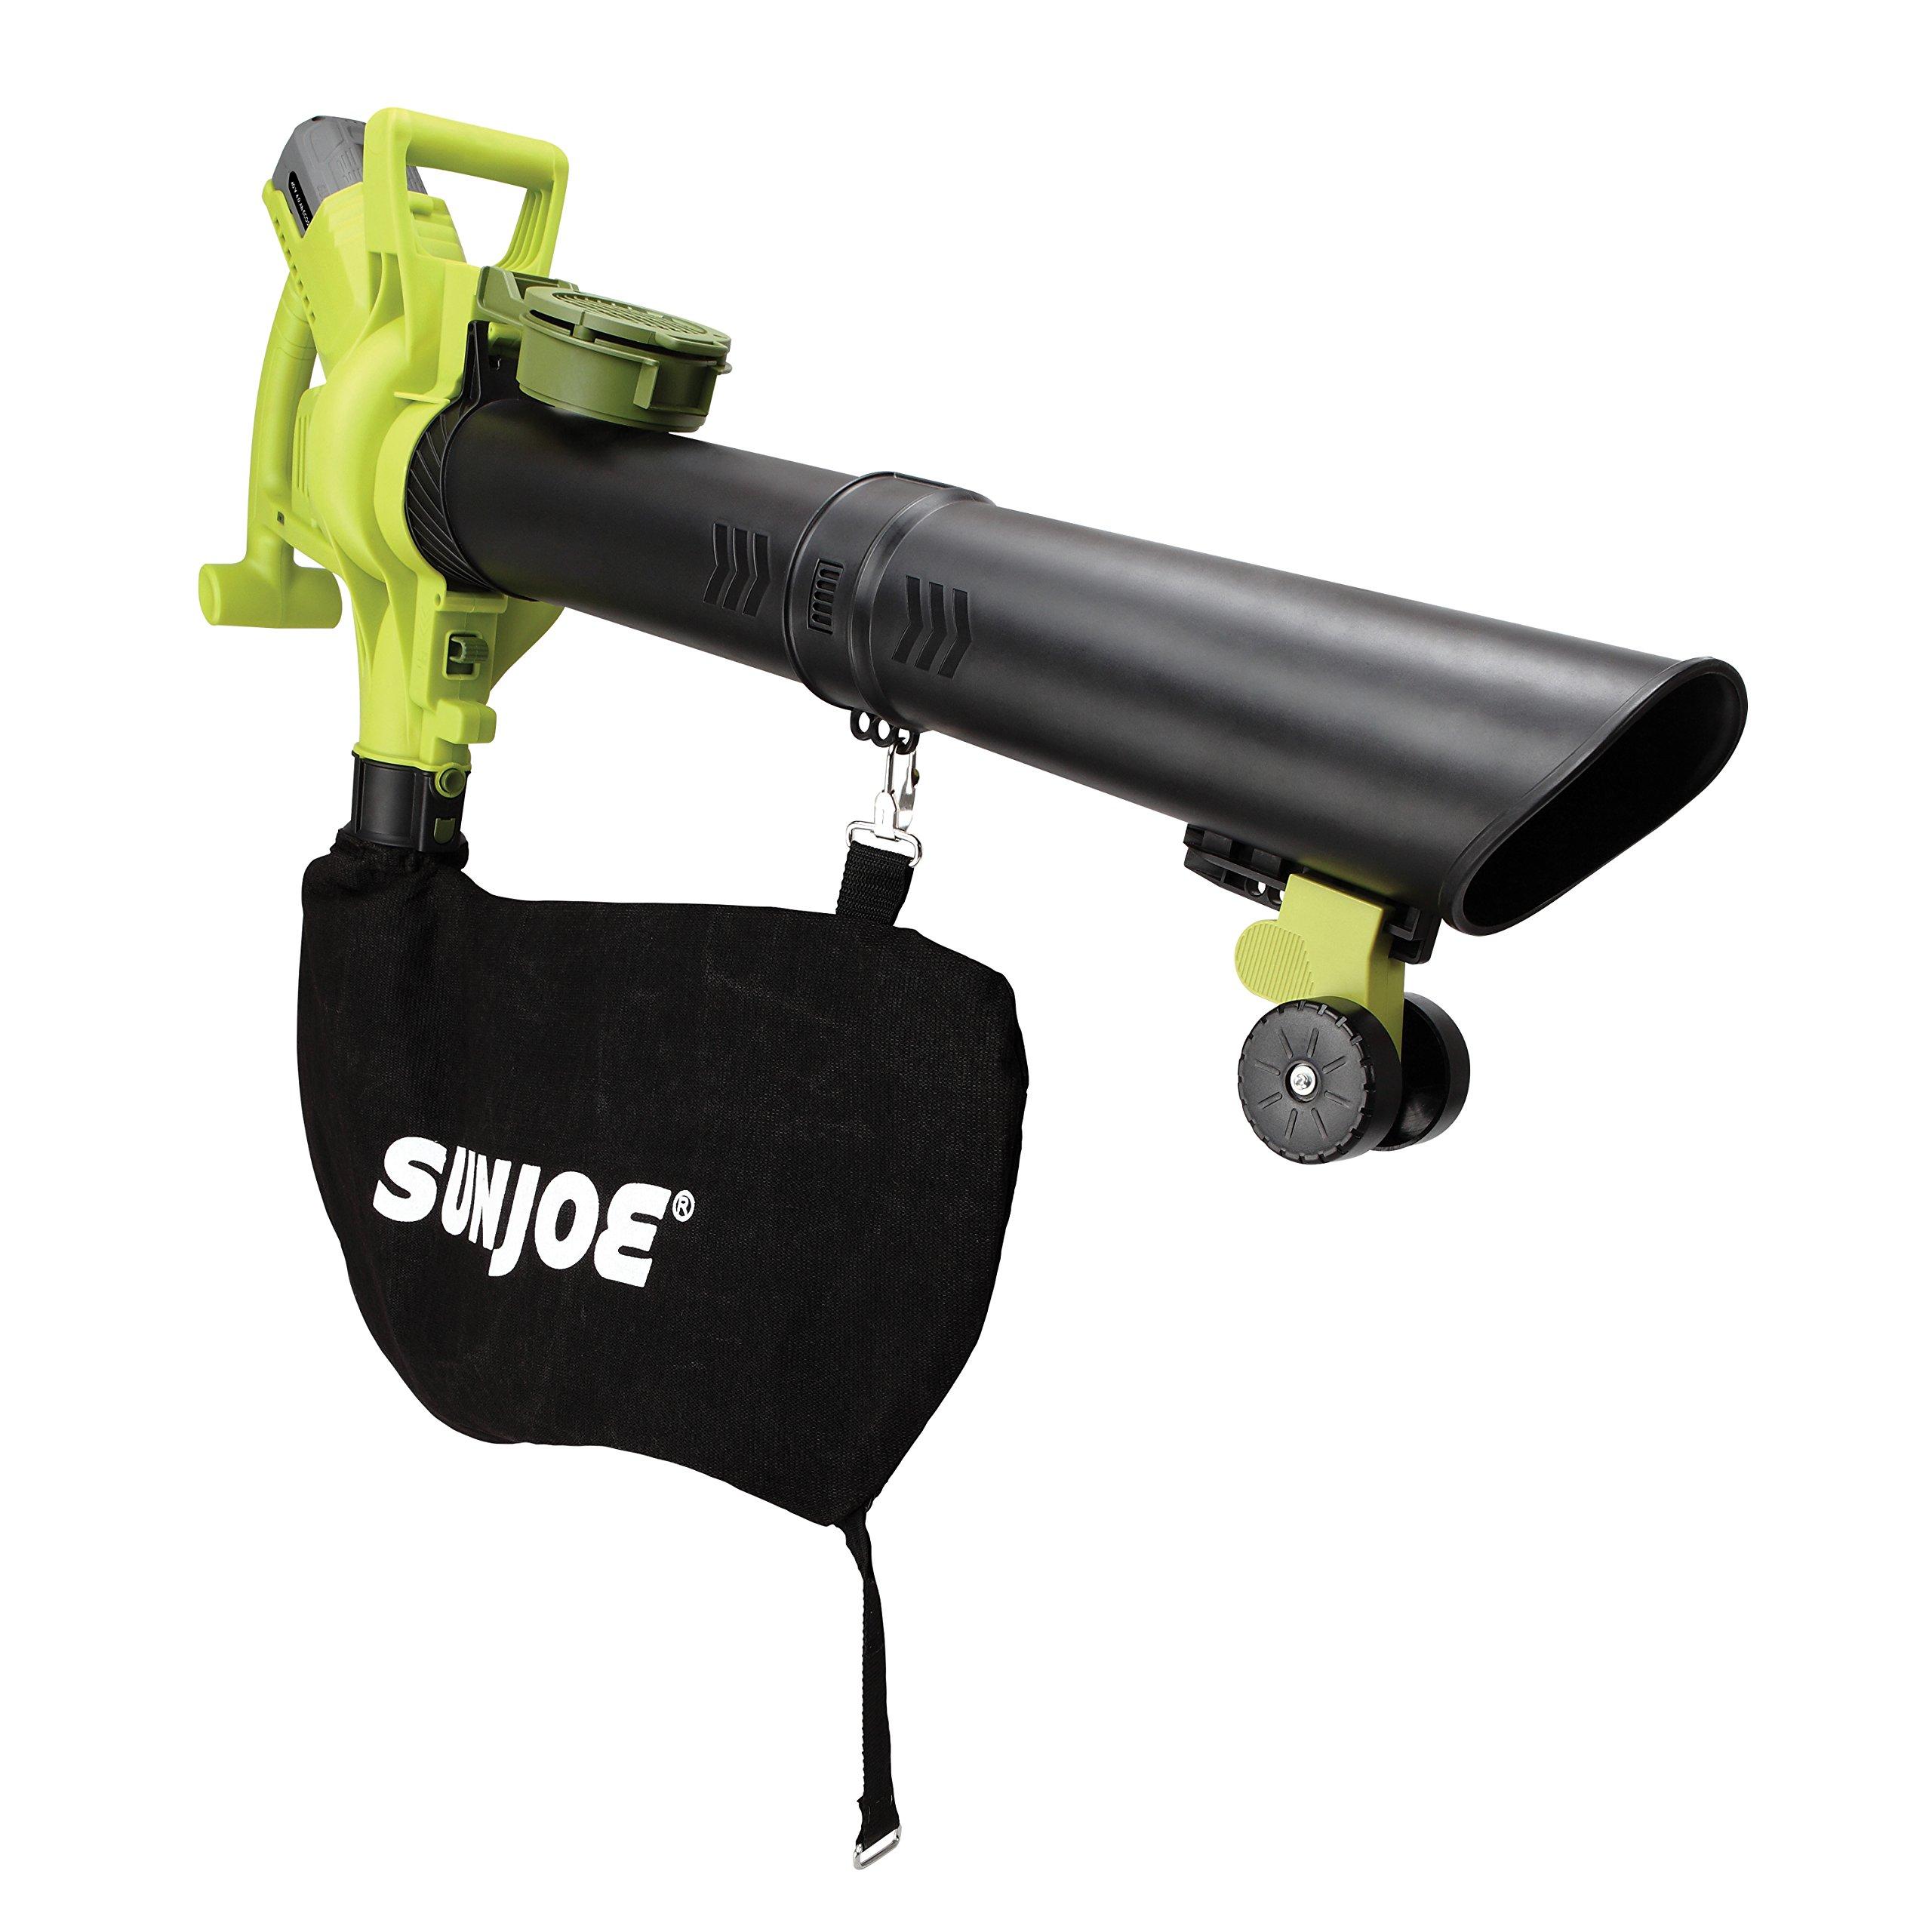 Sun Joe iONBV-RM Variable-Speed Cordless Blower/Vacuum/Mulcher   40-Volt   4.0 Ah (Renewed)